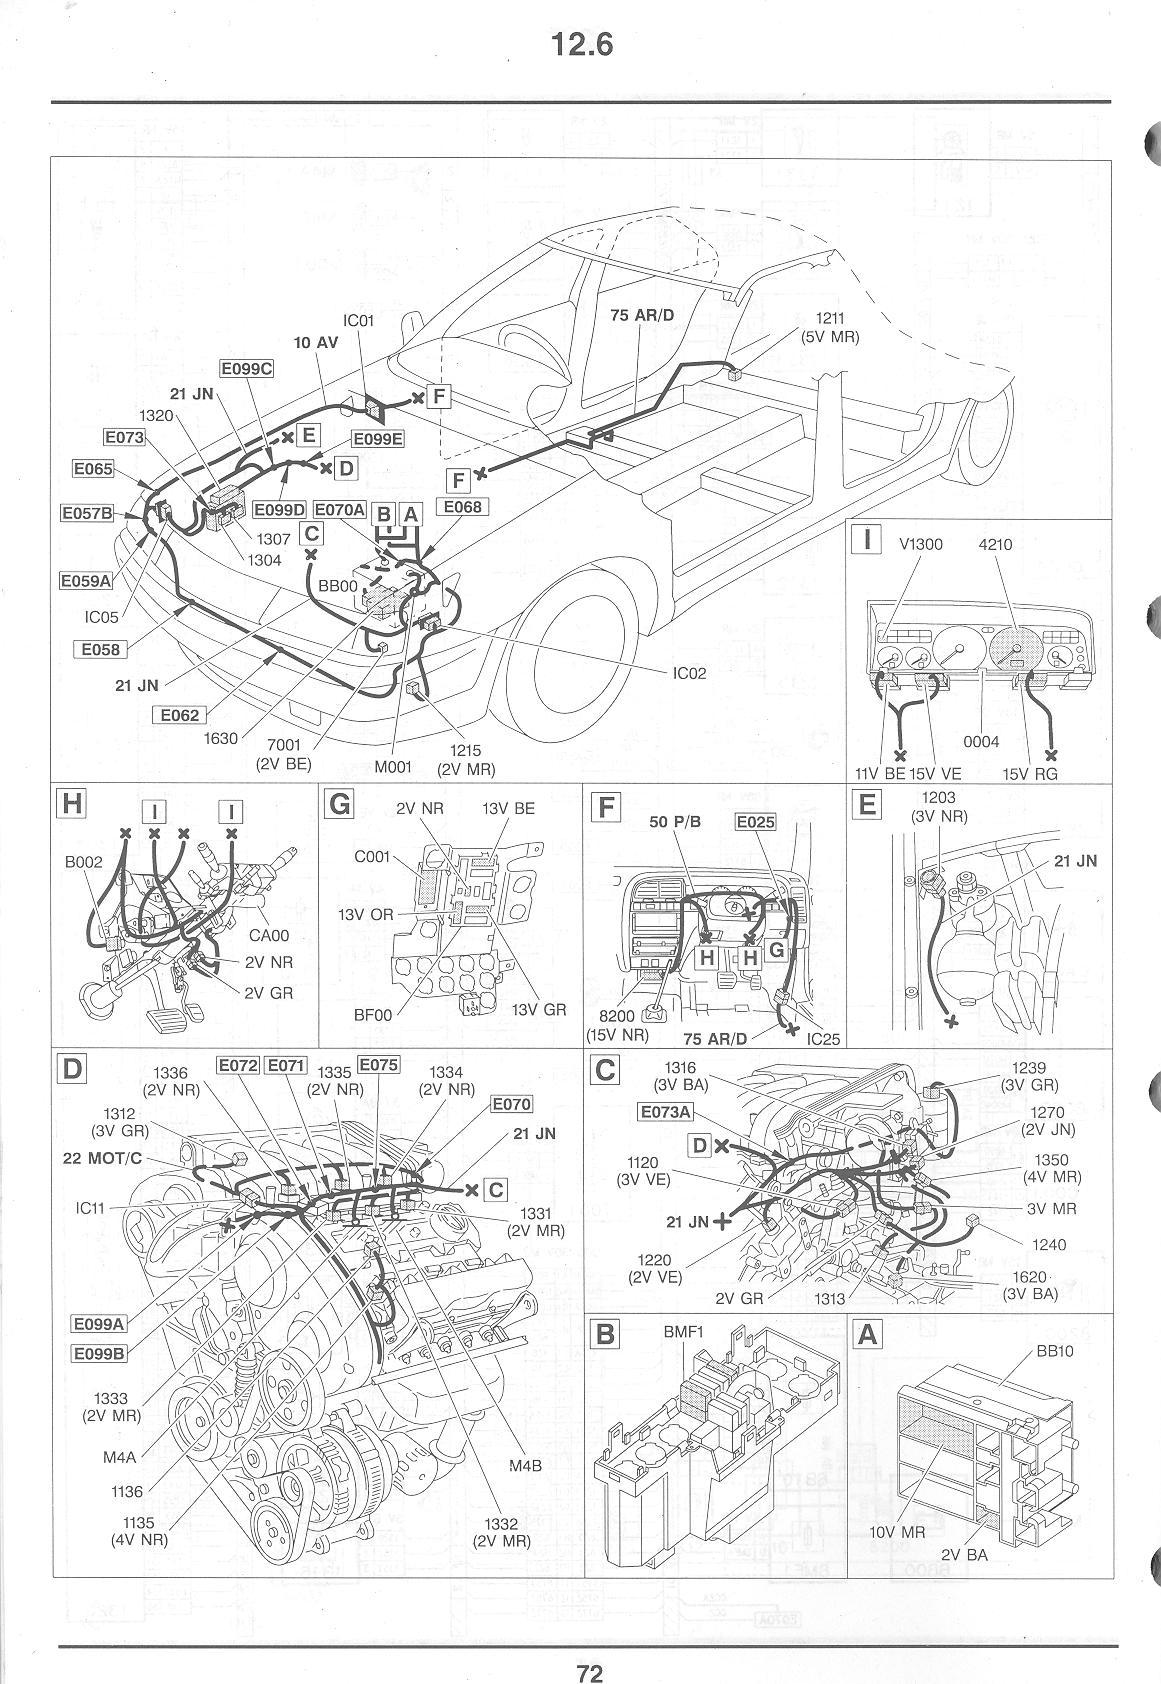 hight resolution of es9j4mk1injloc no light on dashboard french car forum 2005 citroen c5 fuse box